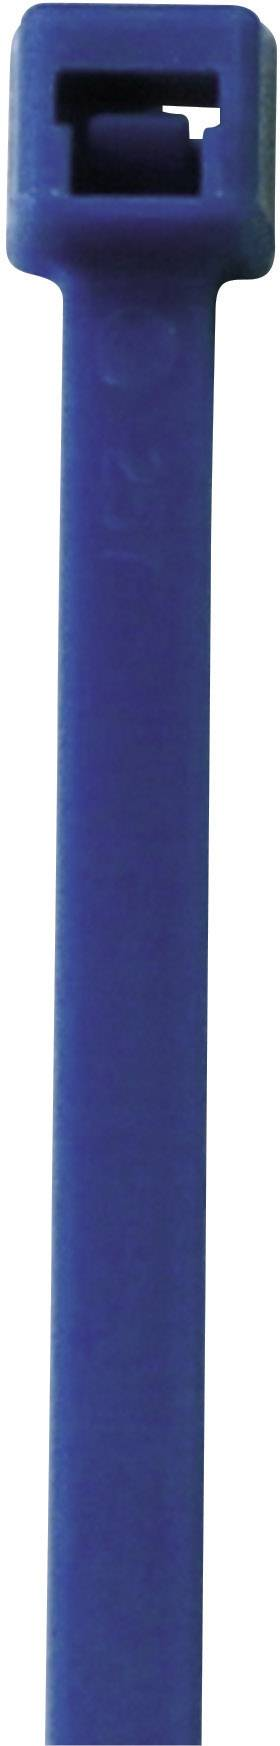 Neonska kabelska vezica, fluorescenčna (D x Š) 192 mm x 4.6 mm modra, 50 kosov, PB Fastener